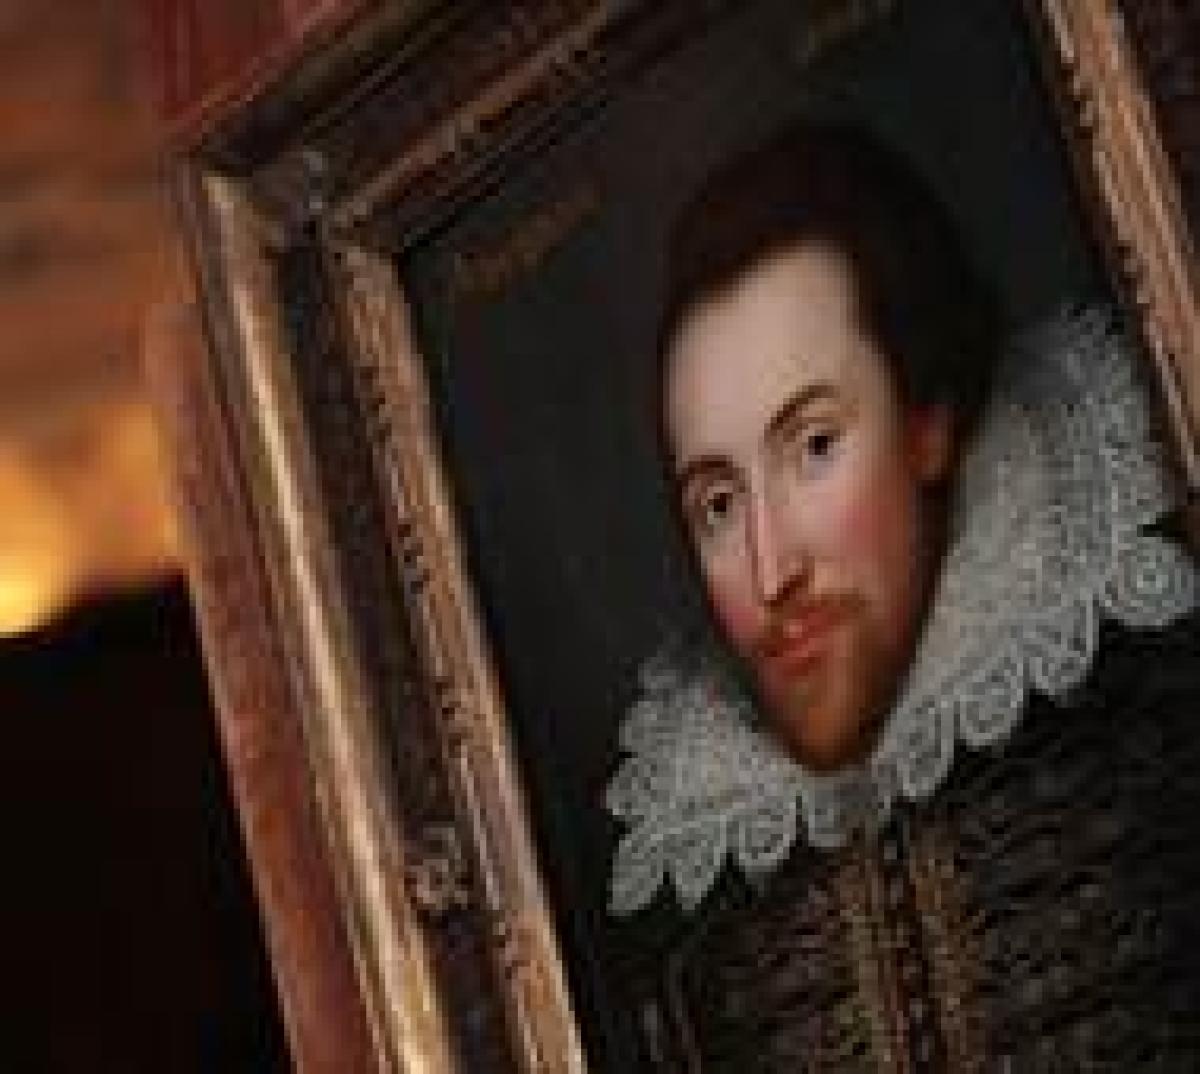 Shakespeare better understood in India than UK: Survey